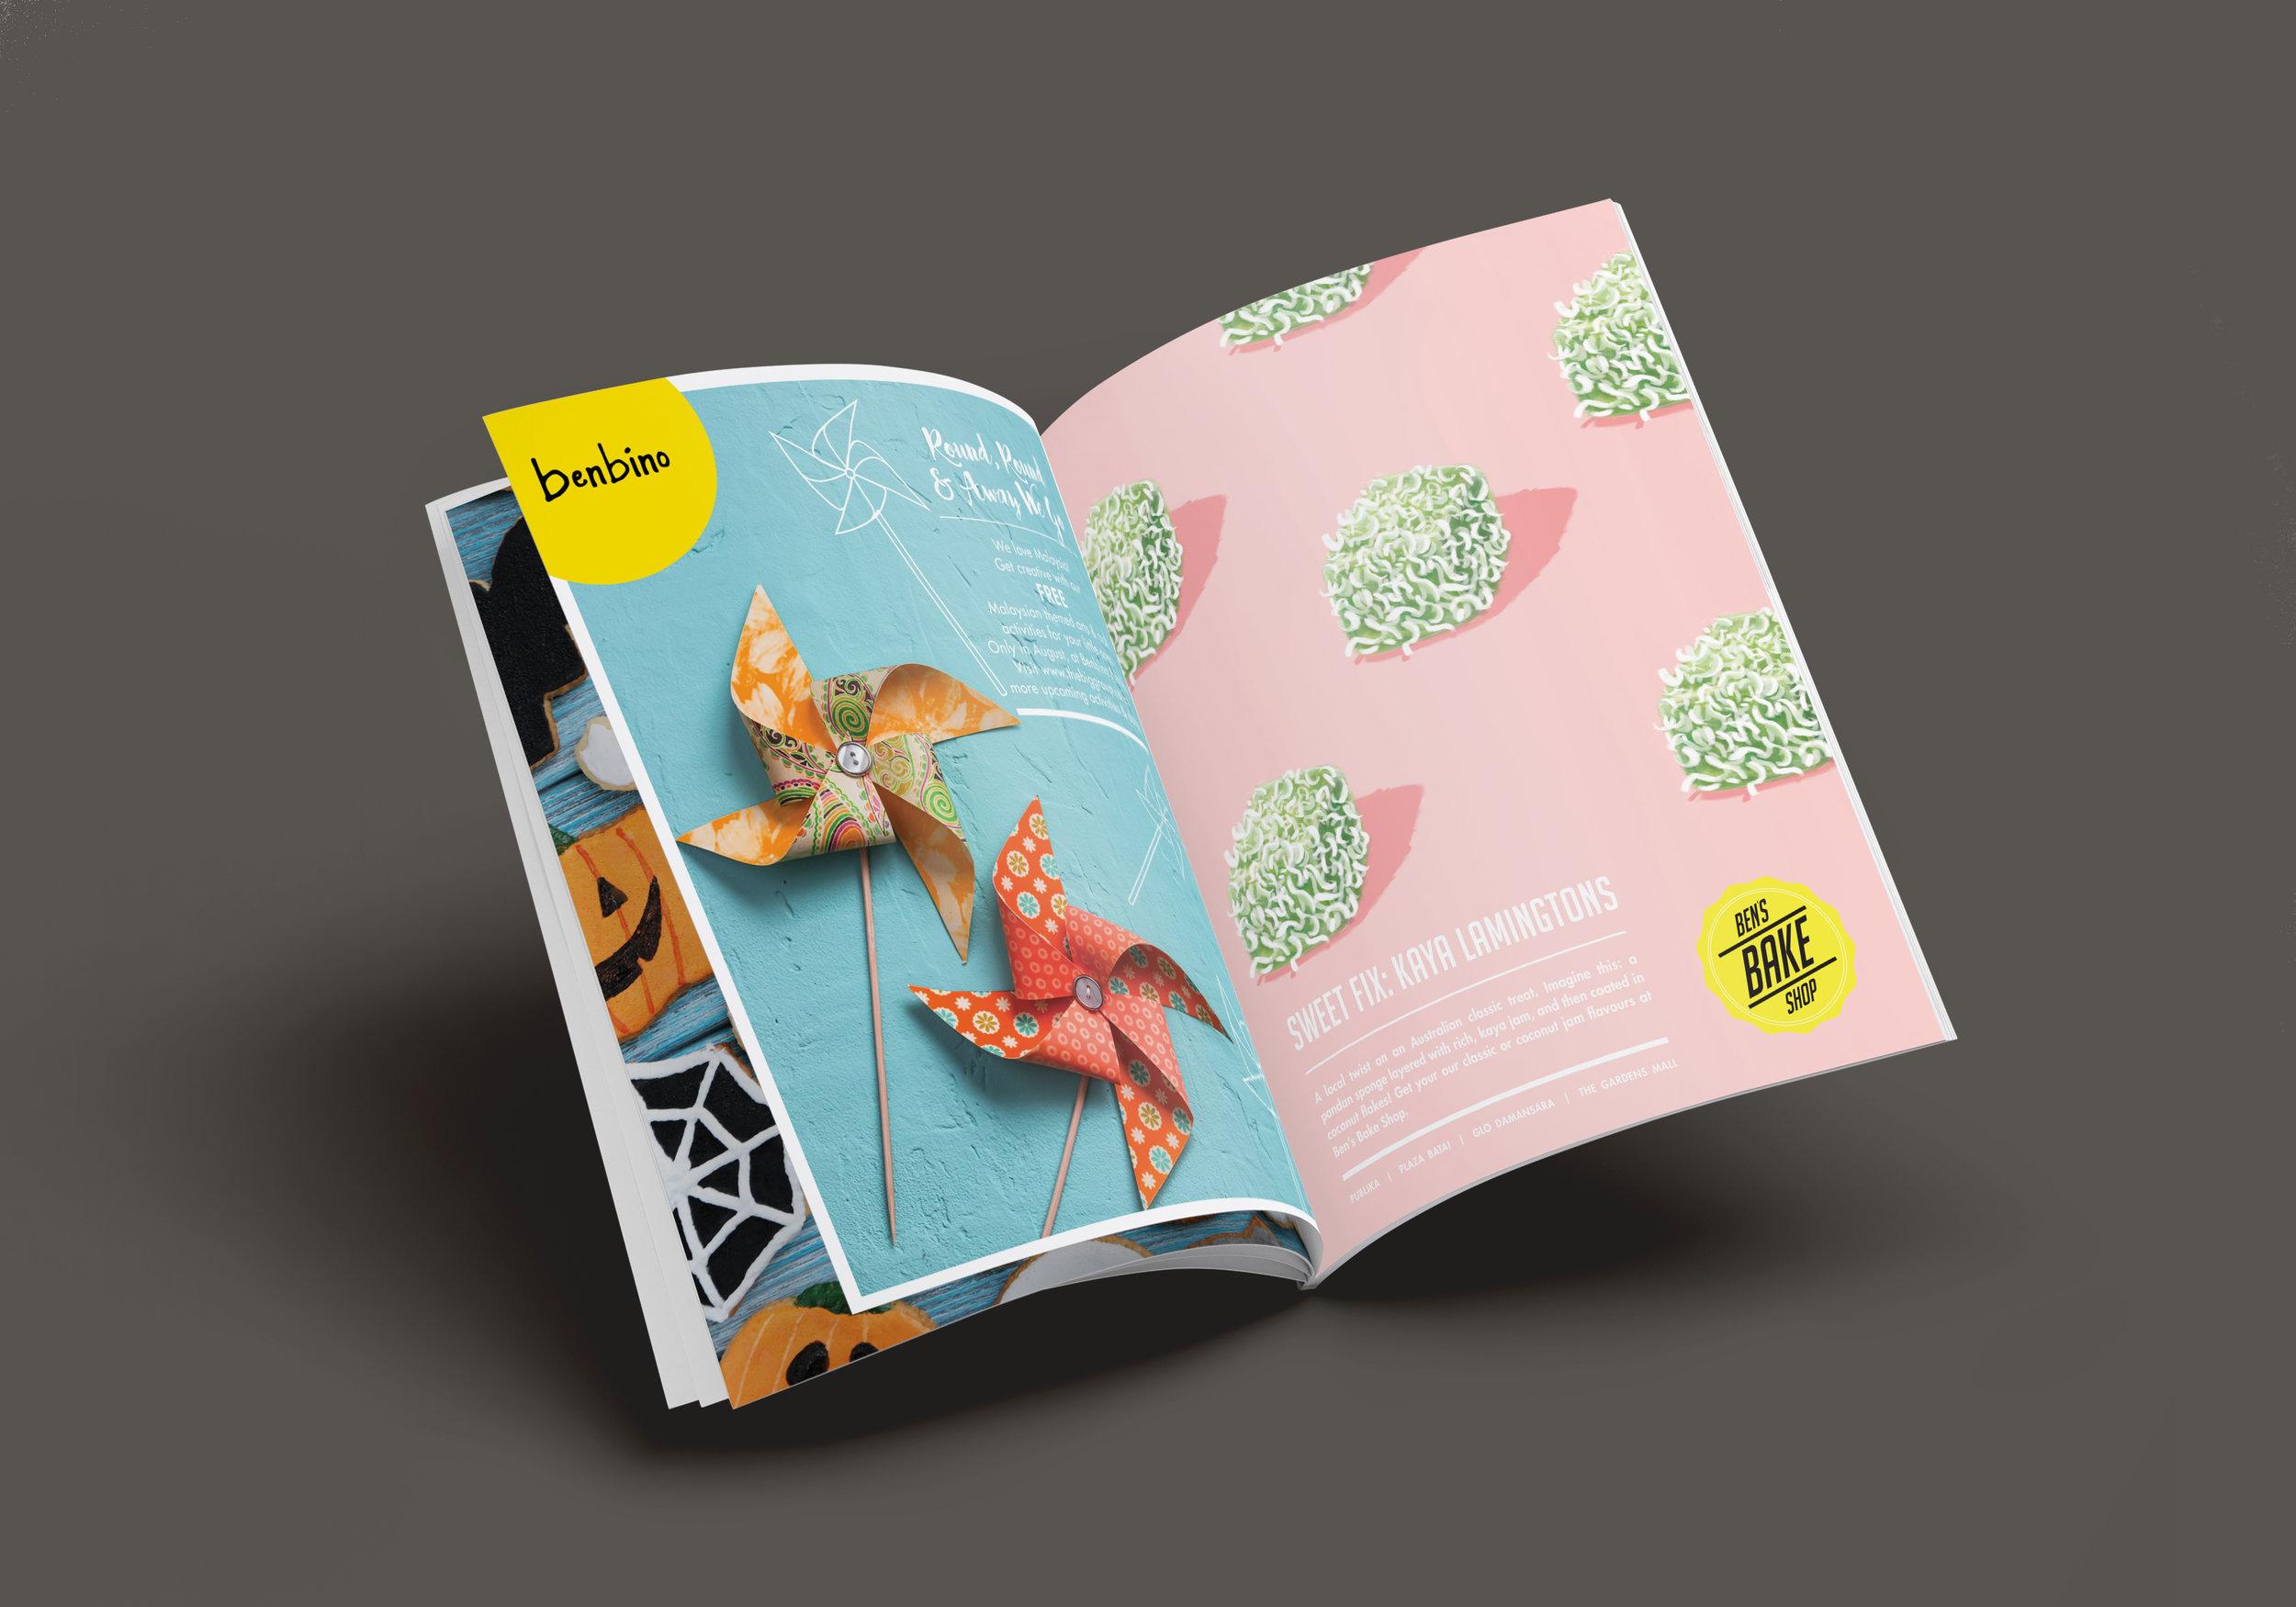 TBL-magazine-mockup-2.jpg